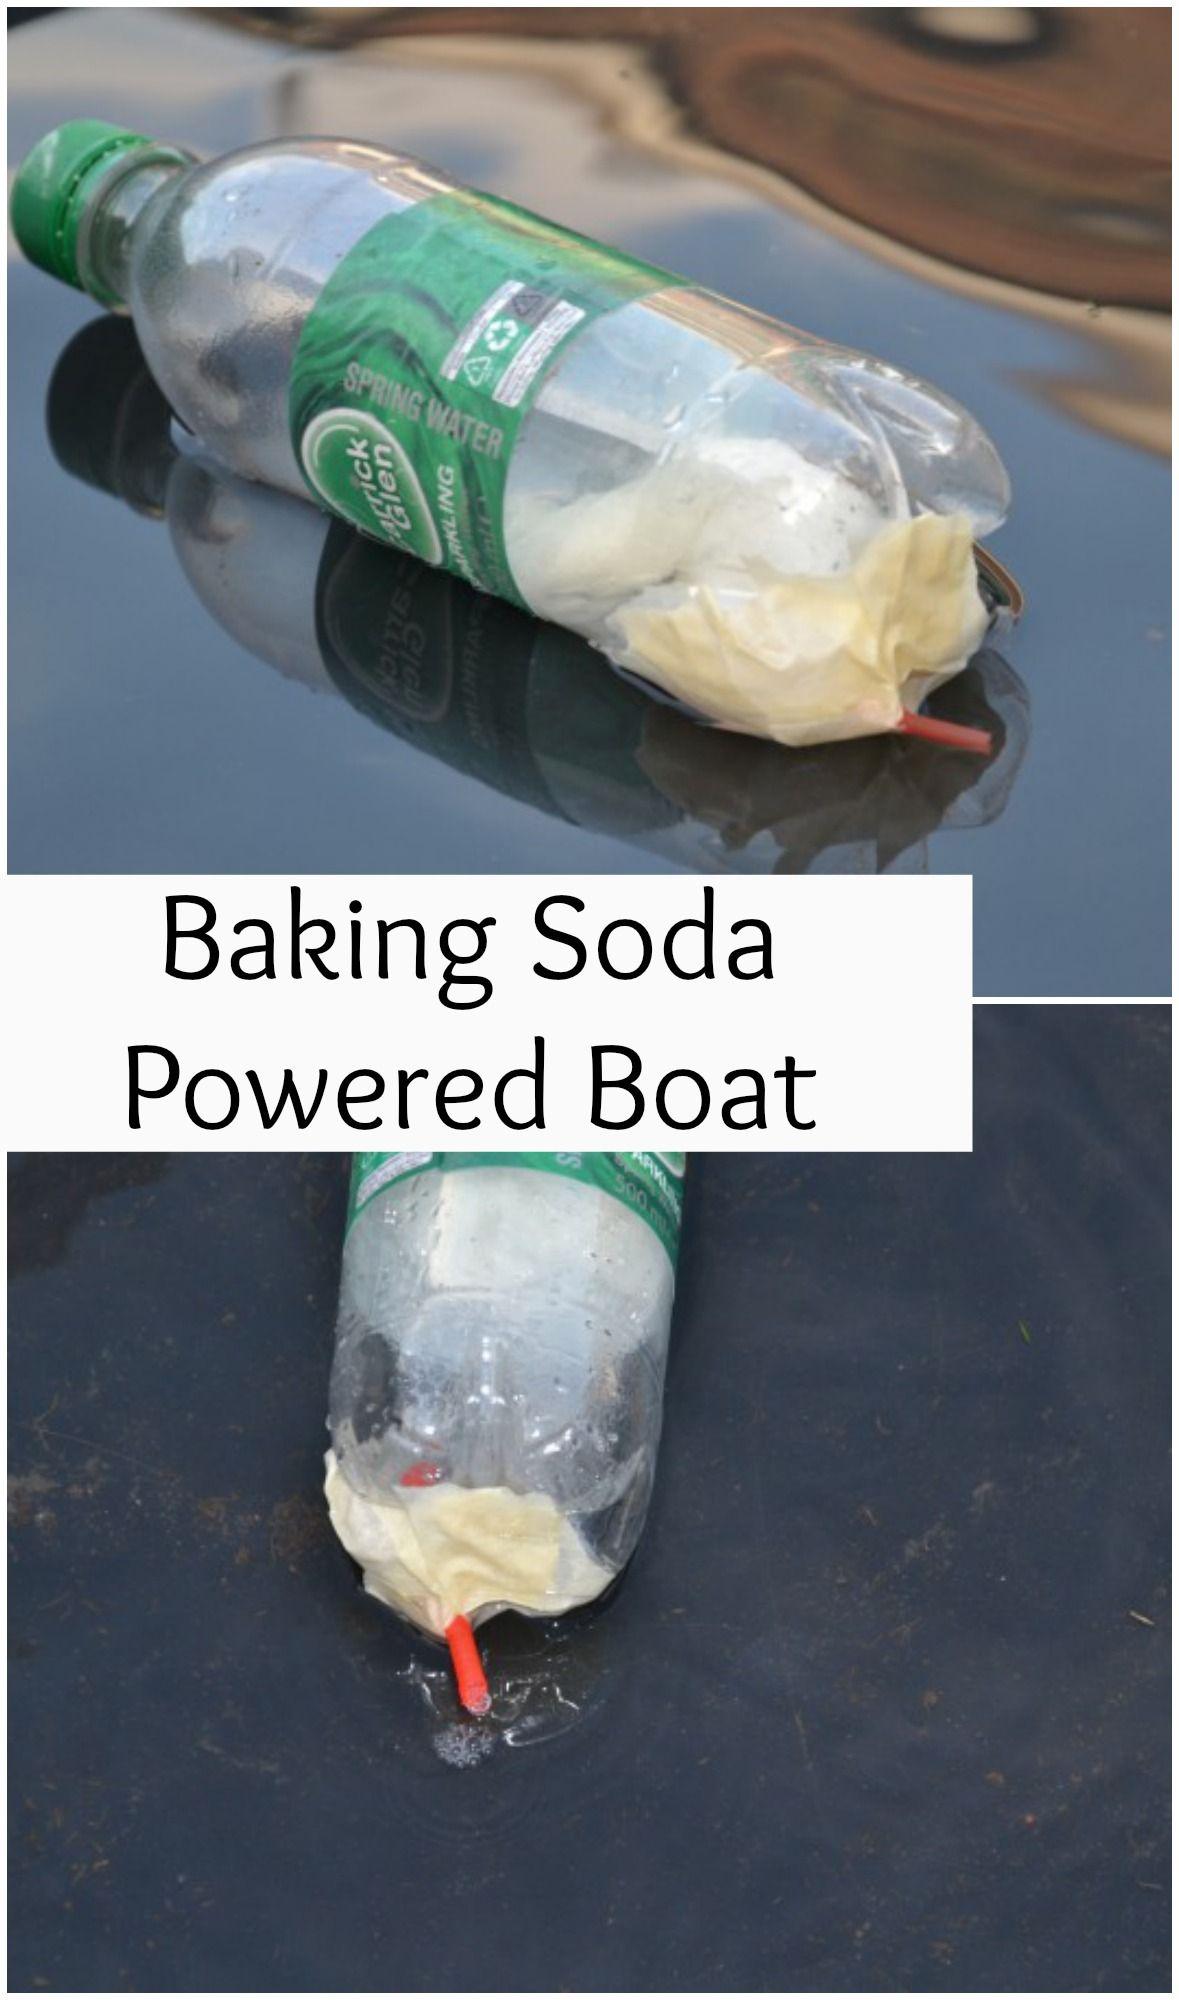 Make a baking soda powered boat #Science